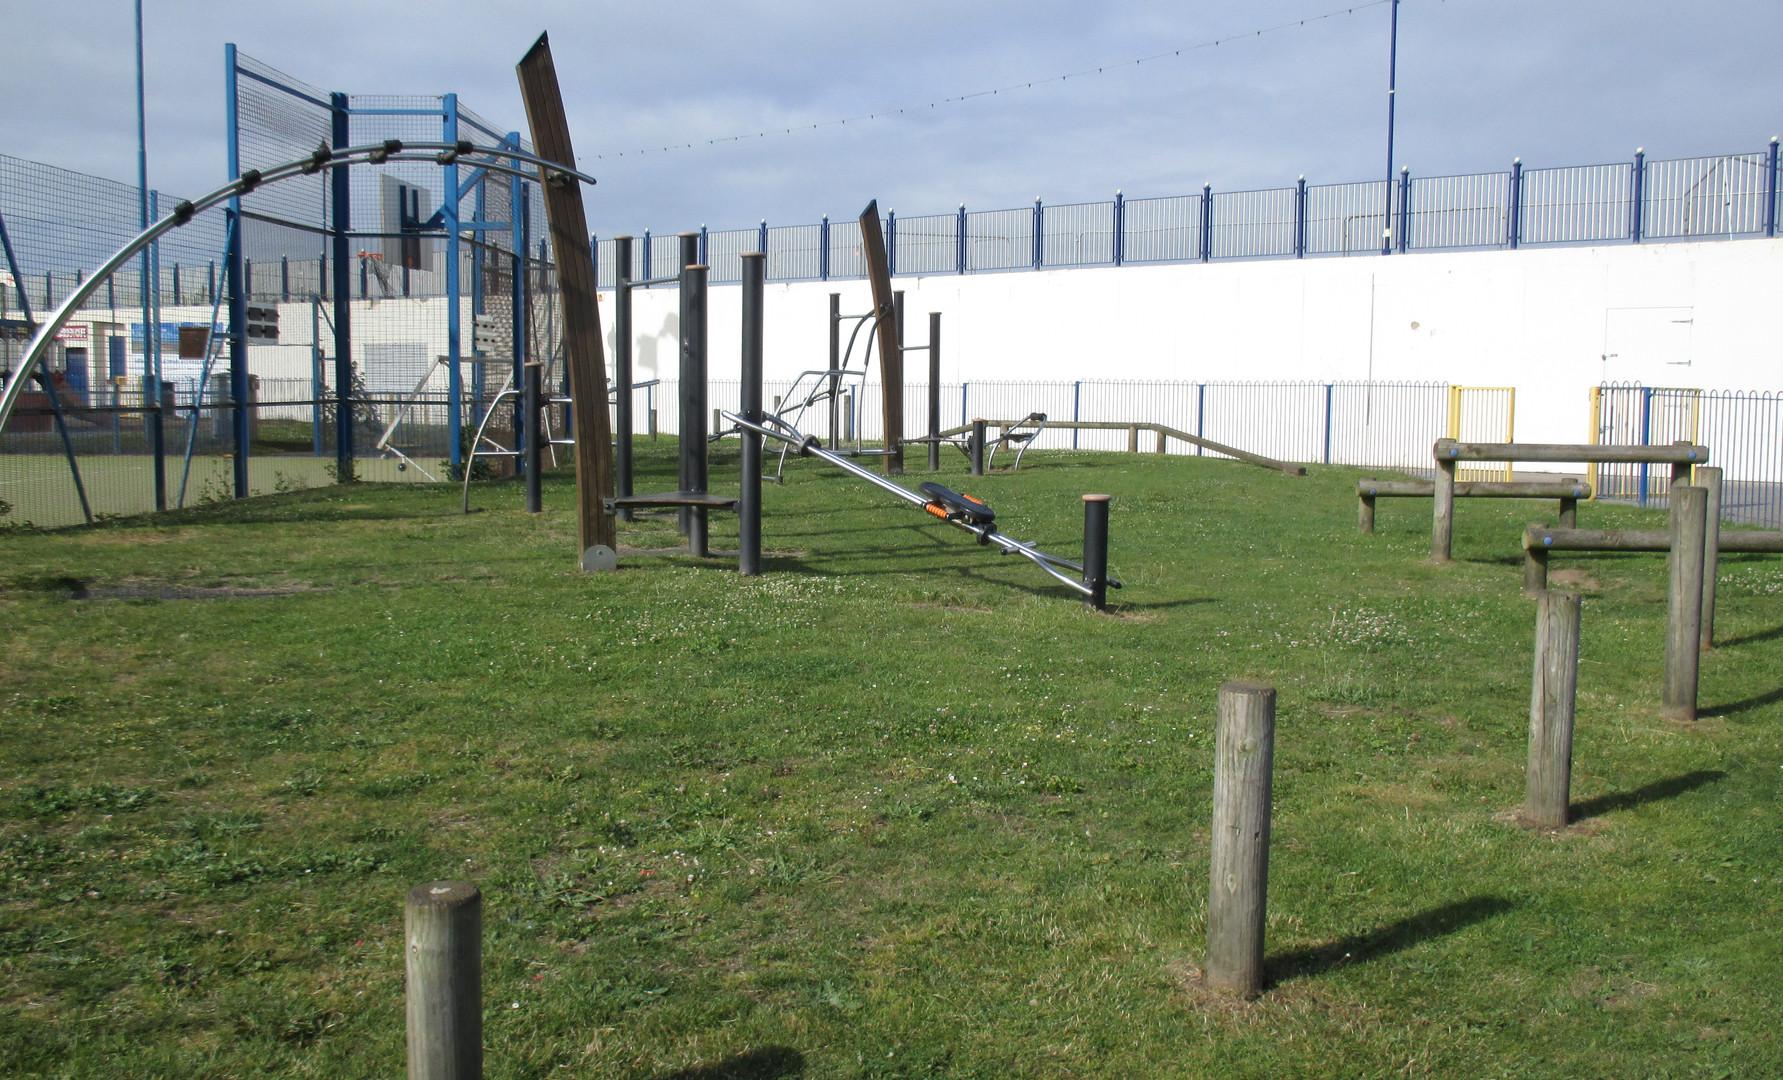 Children's play area in the pleasure gardens